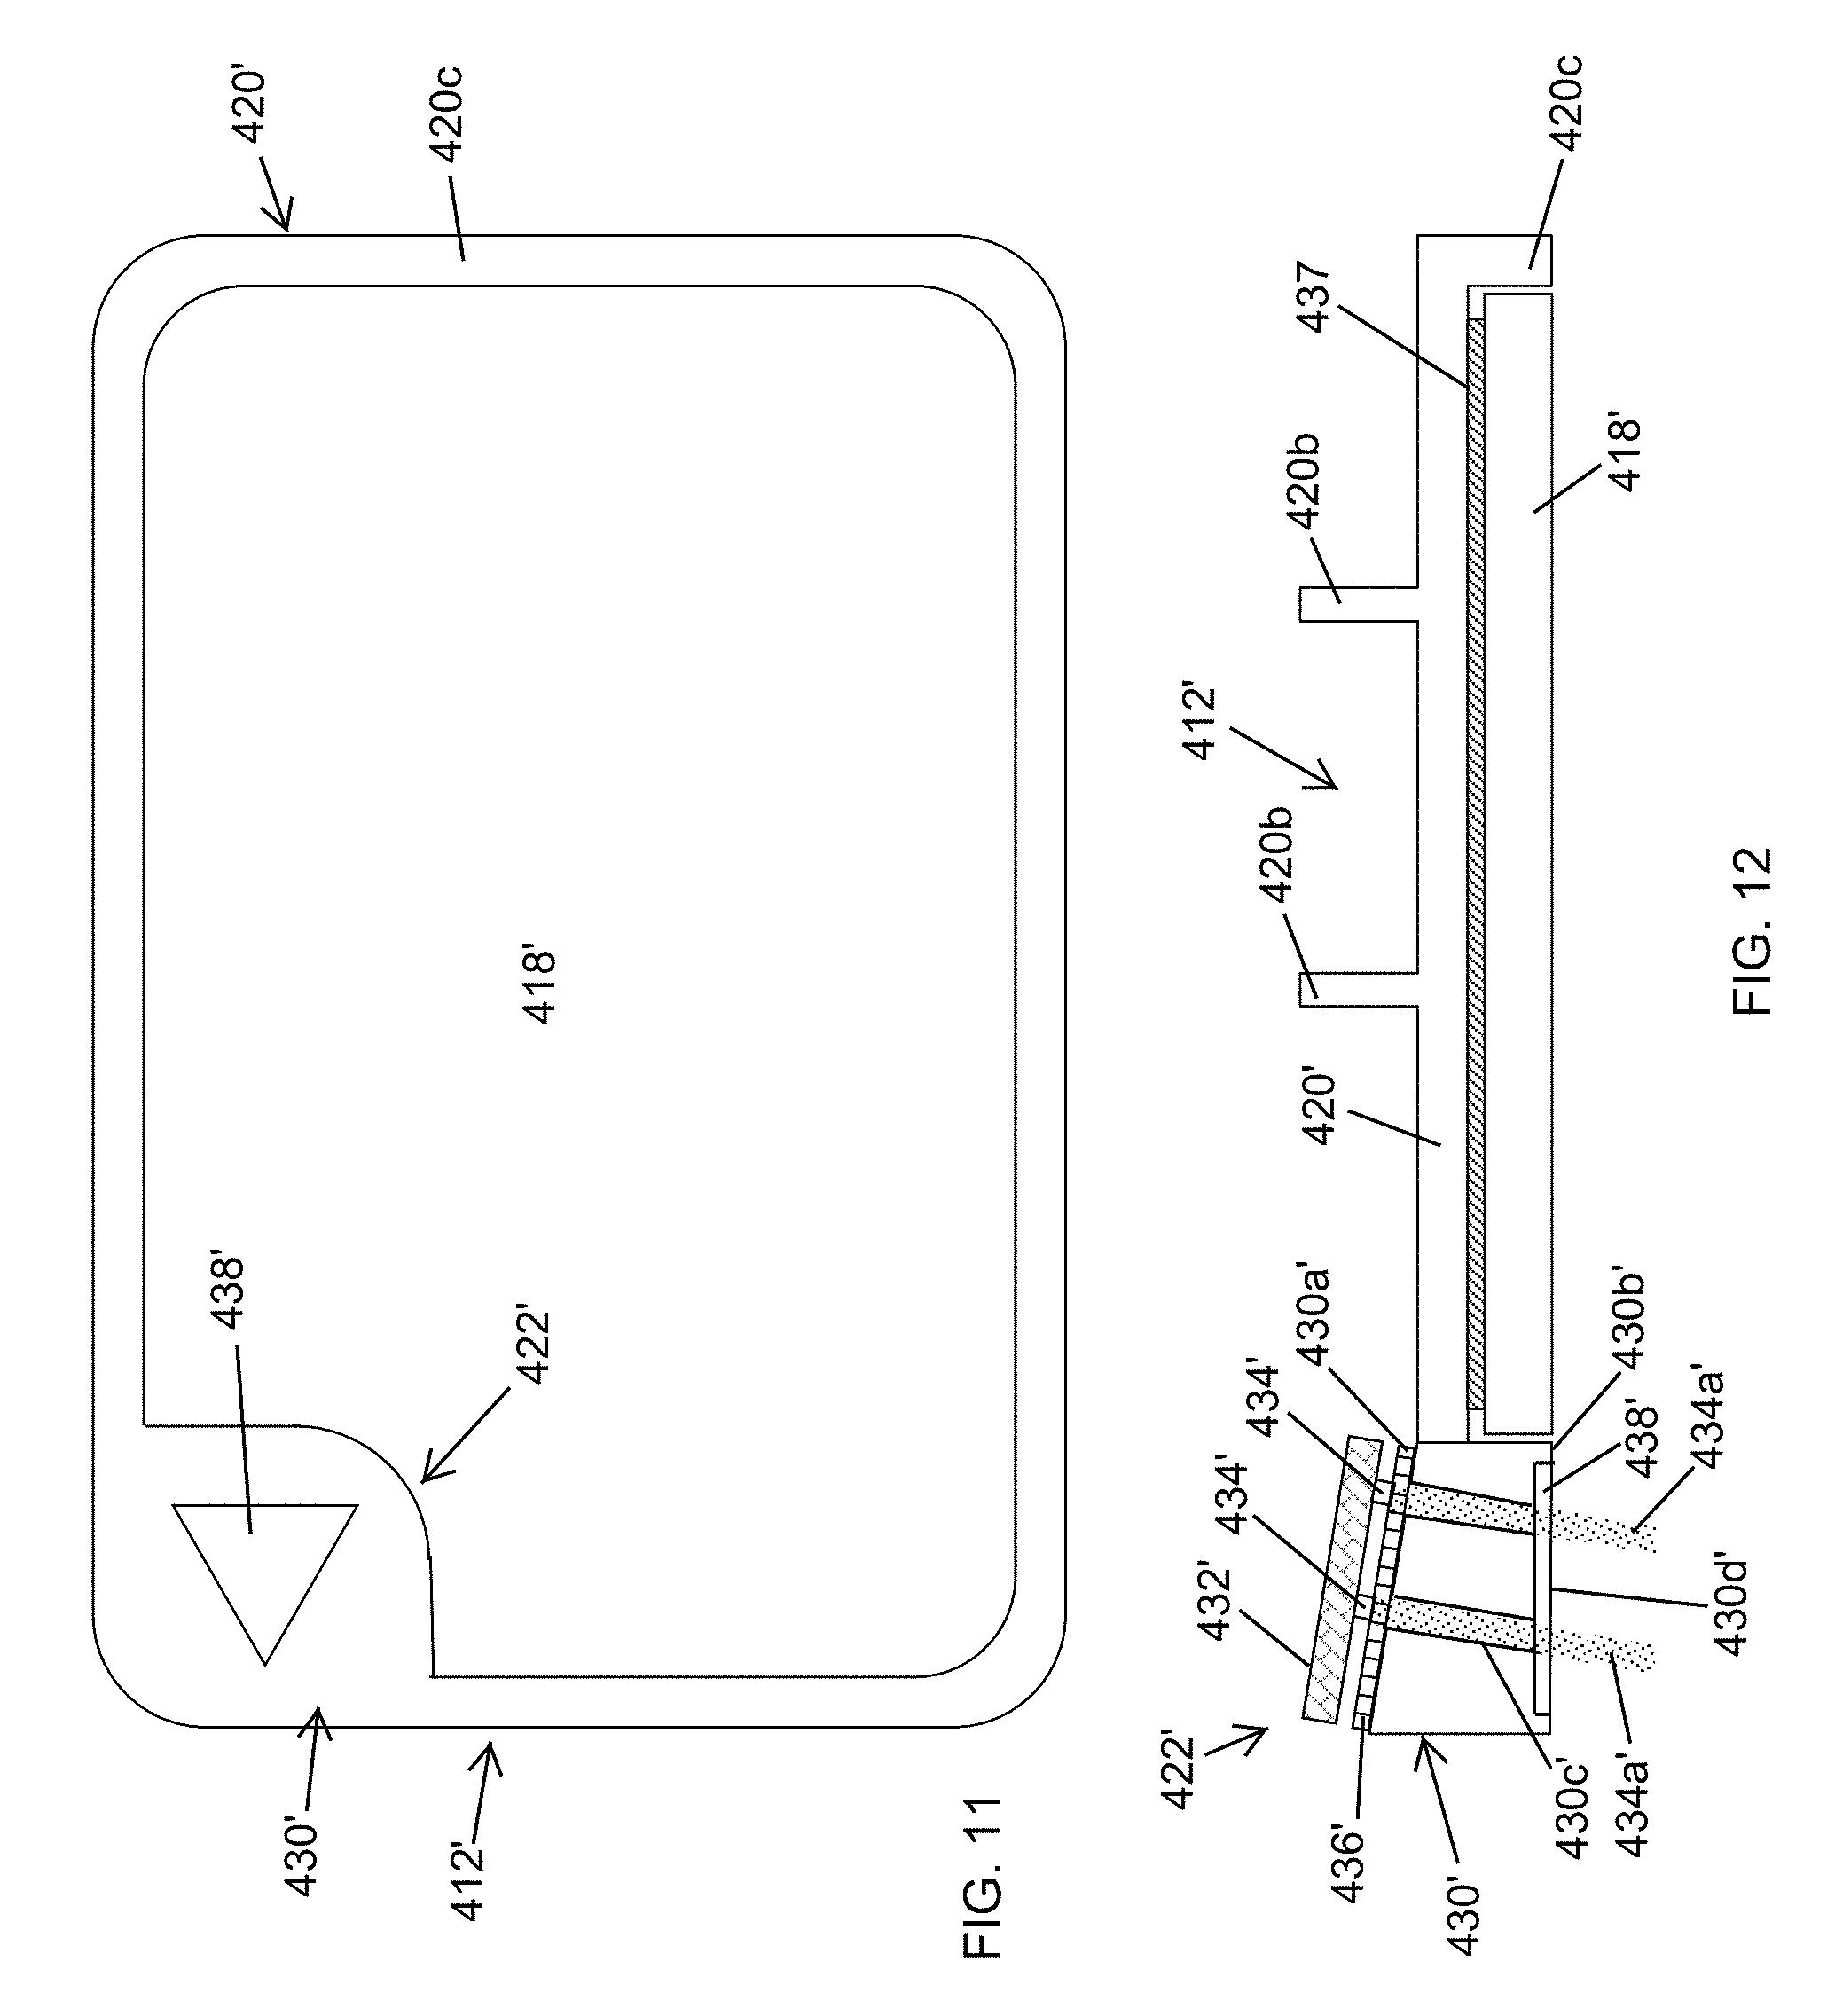 Patent Us 9758102 B1 Kawasaki Curve Wiring Diagram 0 Petitions